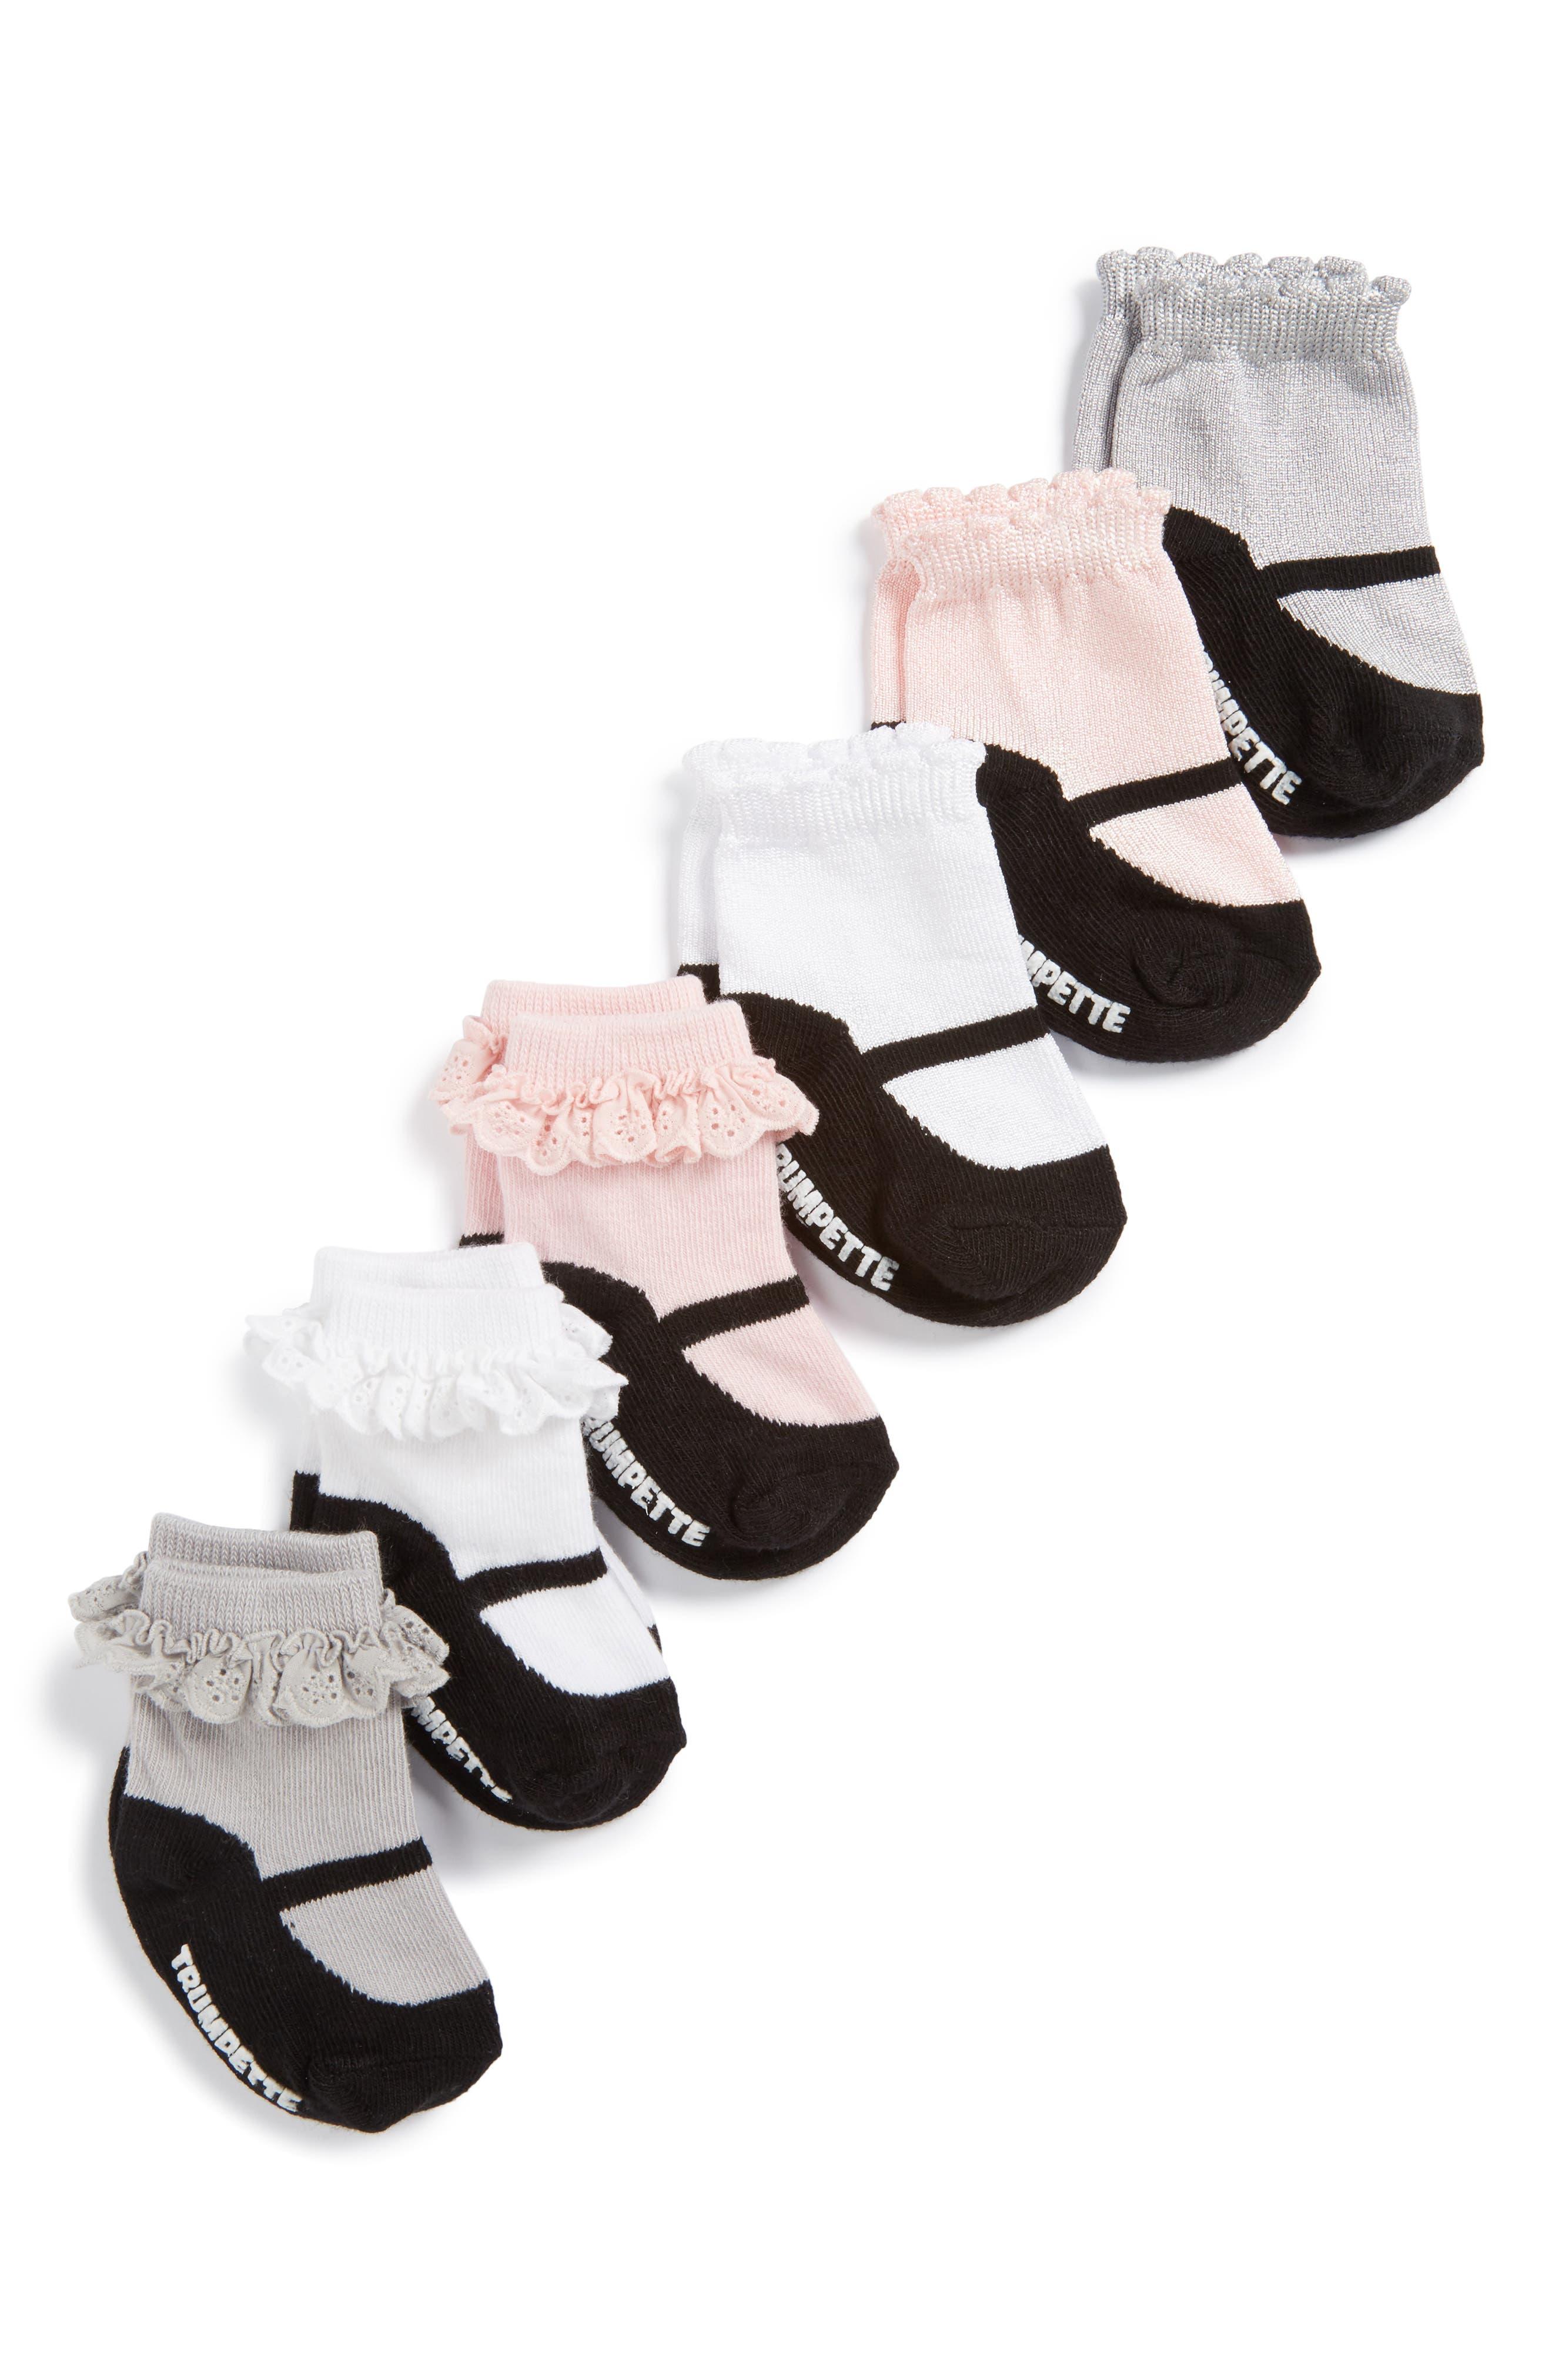 Taylors 6-Pack Socks,                             Alternate thumbnail 2, color,                             001